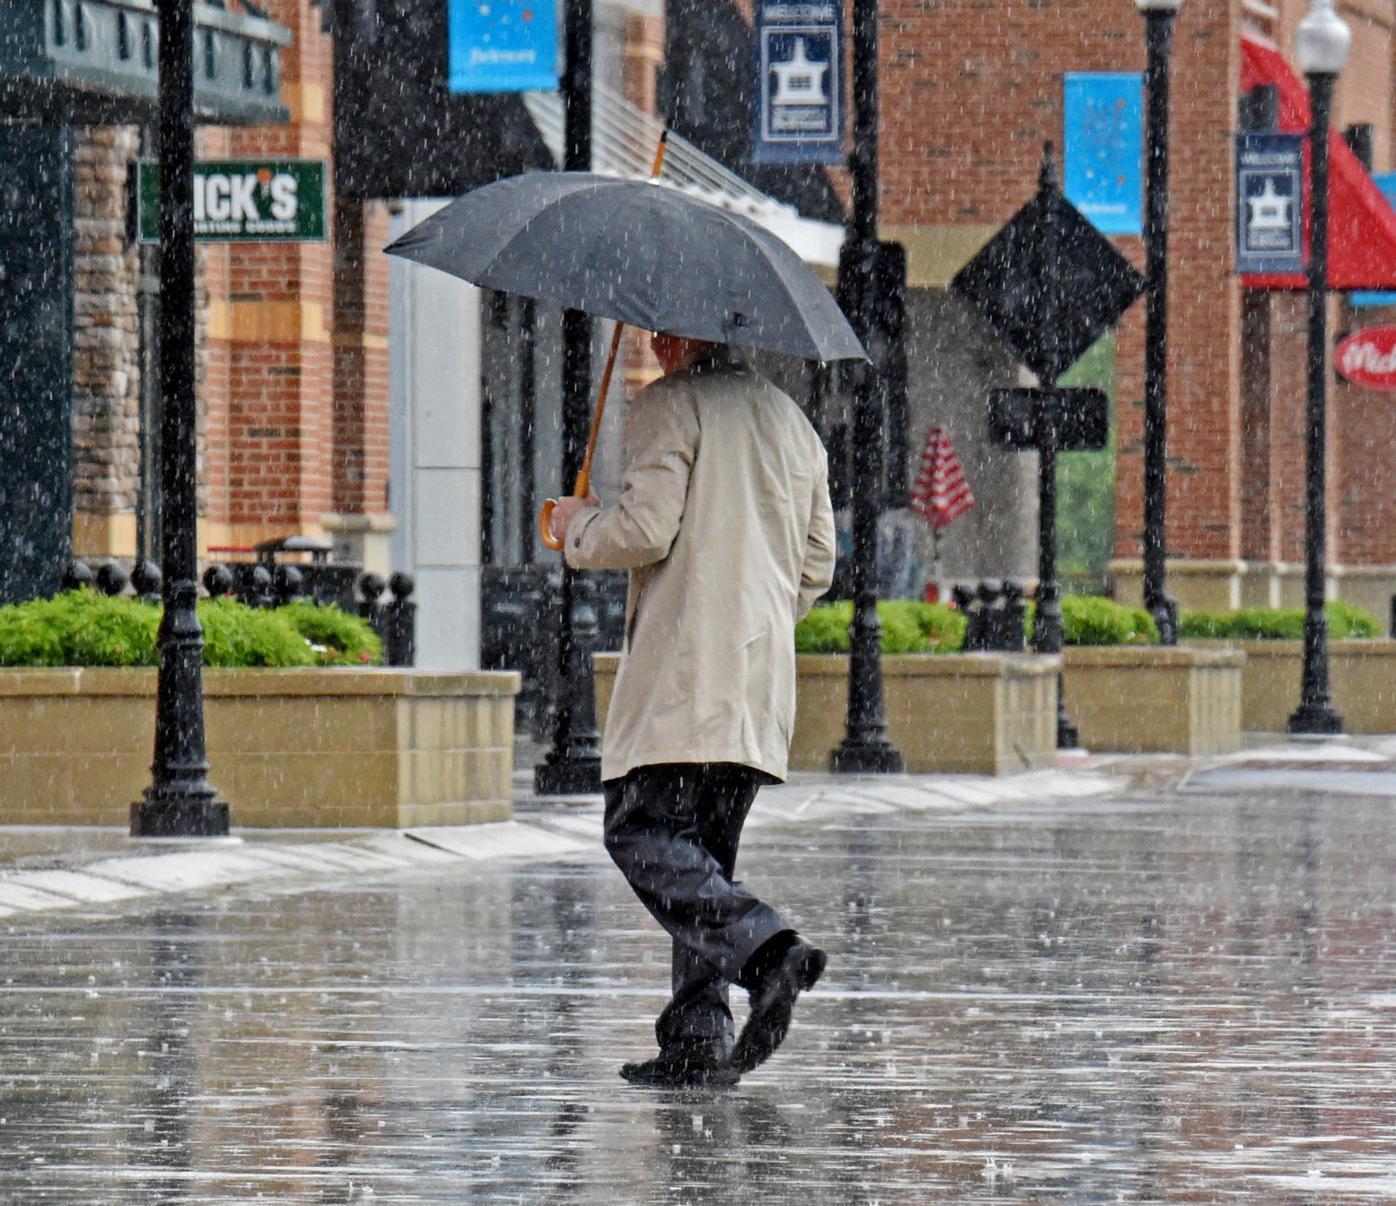 Rain May 13 2019